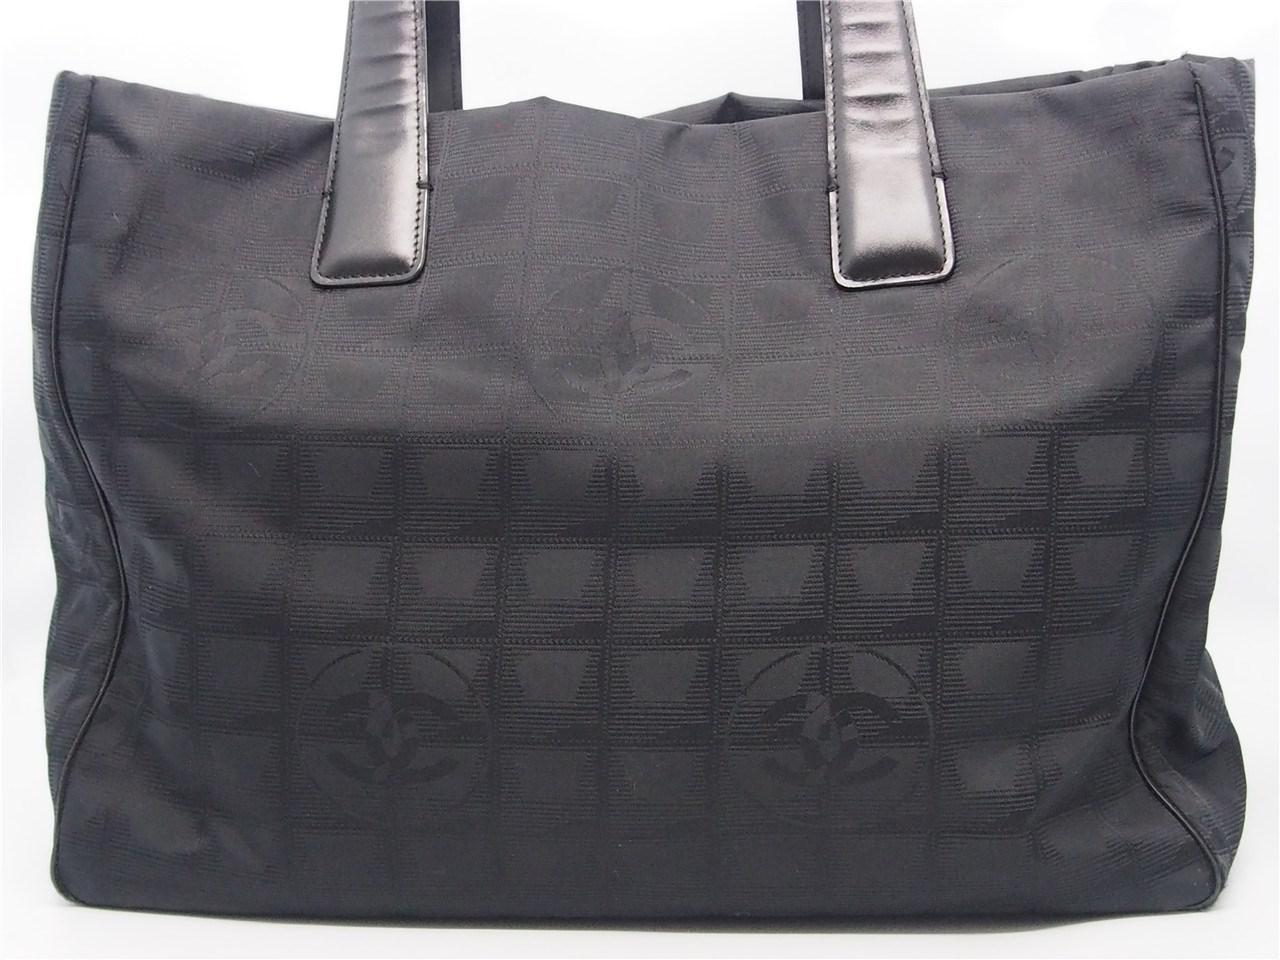 Lyst - Chanel Authentic Black Nylon Cc Logo Travel Line Shopper Tote ... b8fcd02aa912a